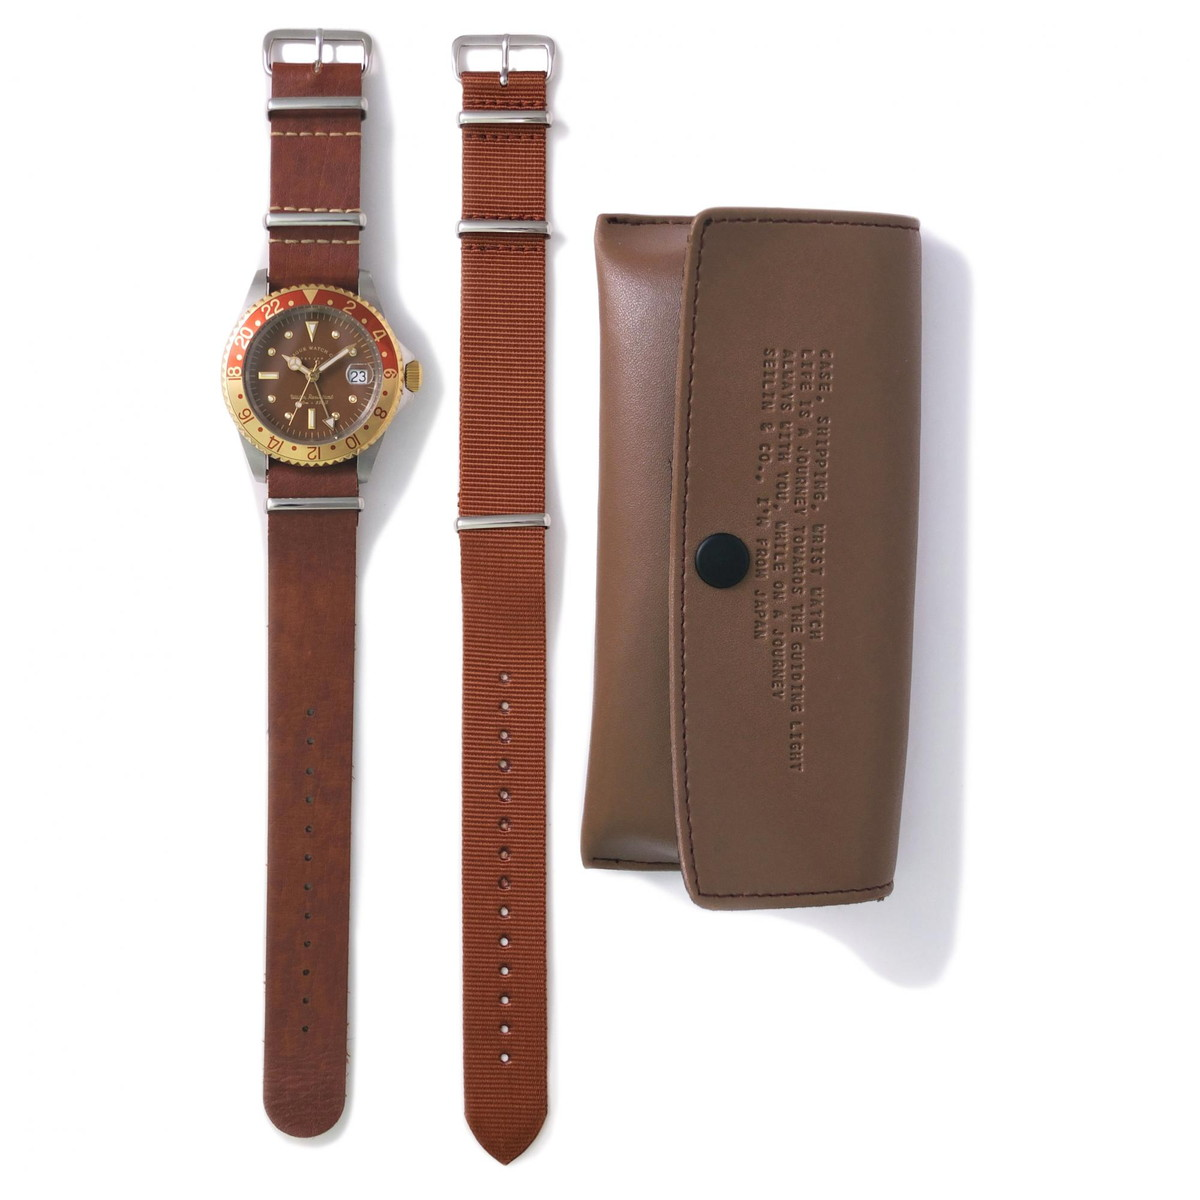 VAGUE WATCH ヴァーグ ウォッチ - VAGUE WATCH BRWN GMT 腕時計